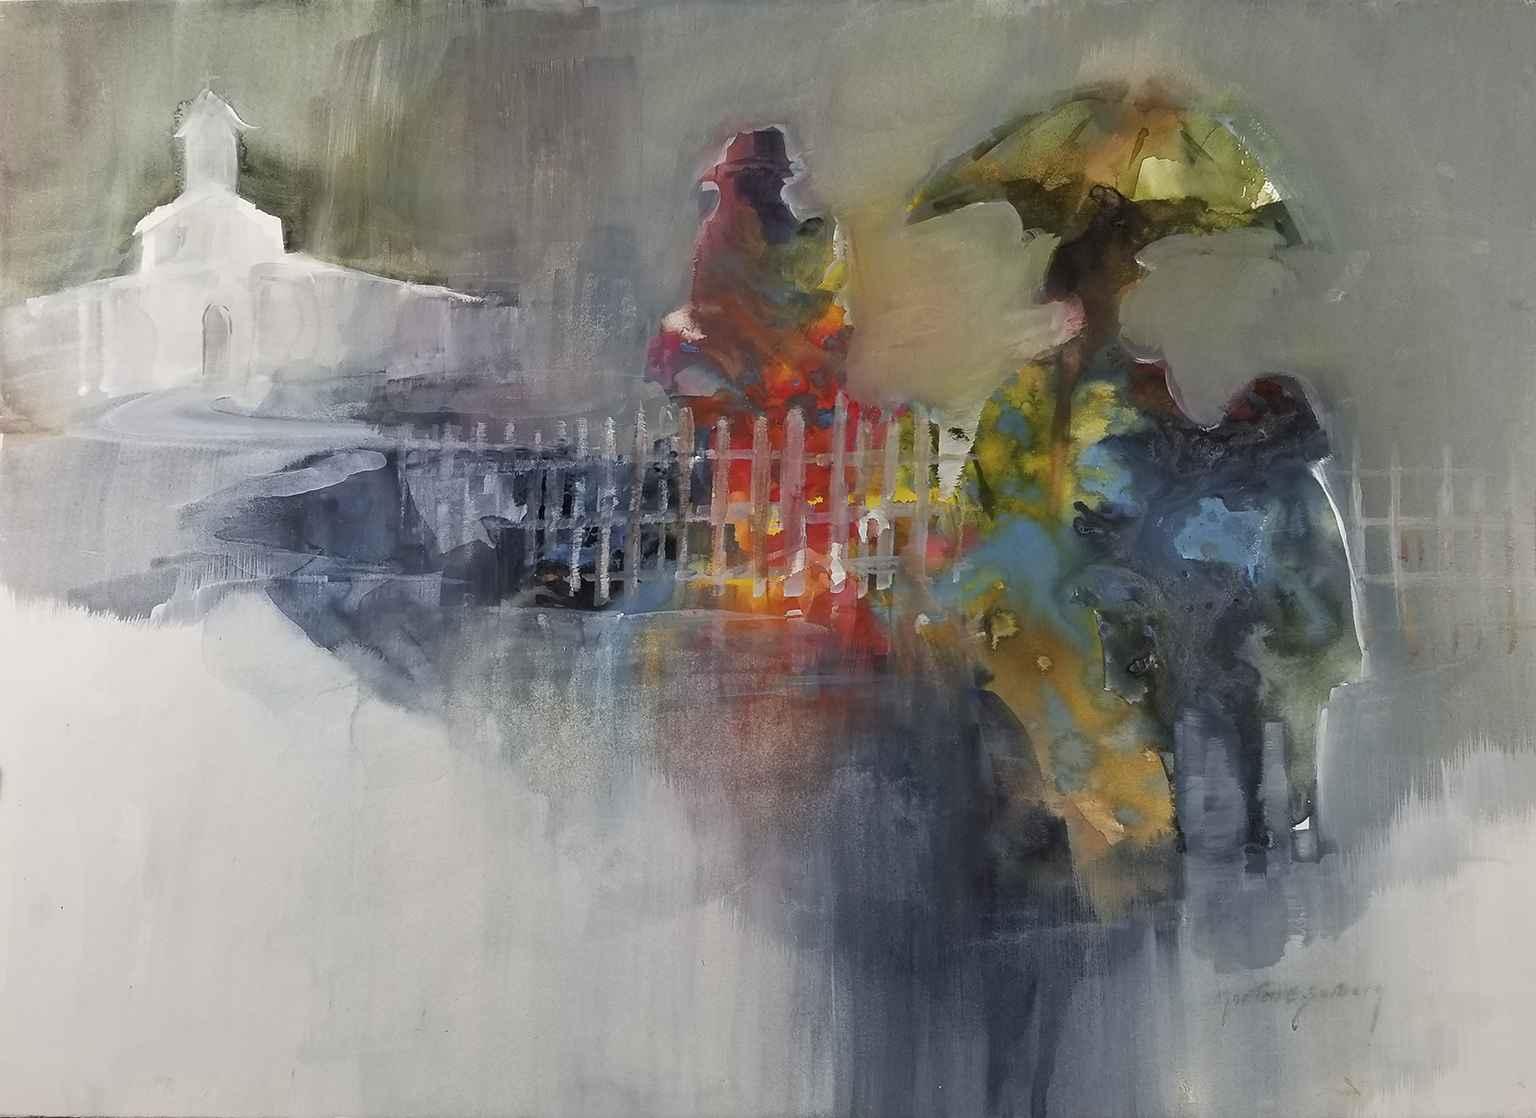 Rainy Day Sunday by  Morten E. Solberg - Masterpiece Online